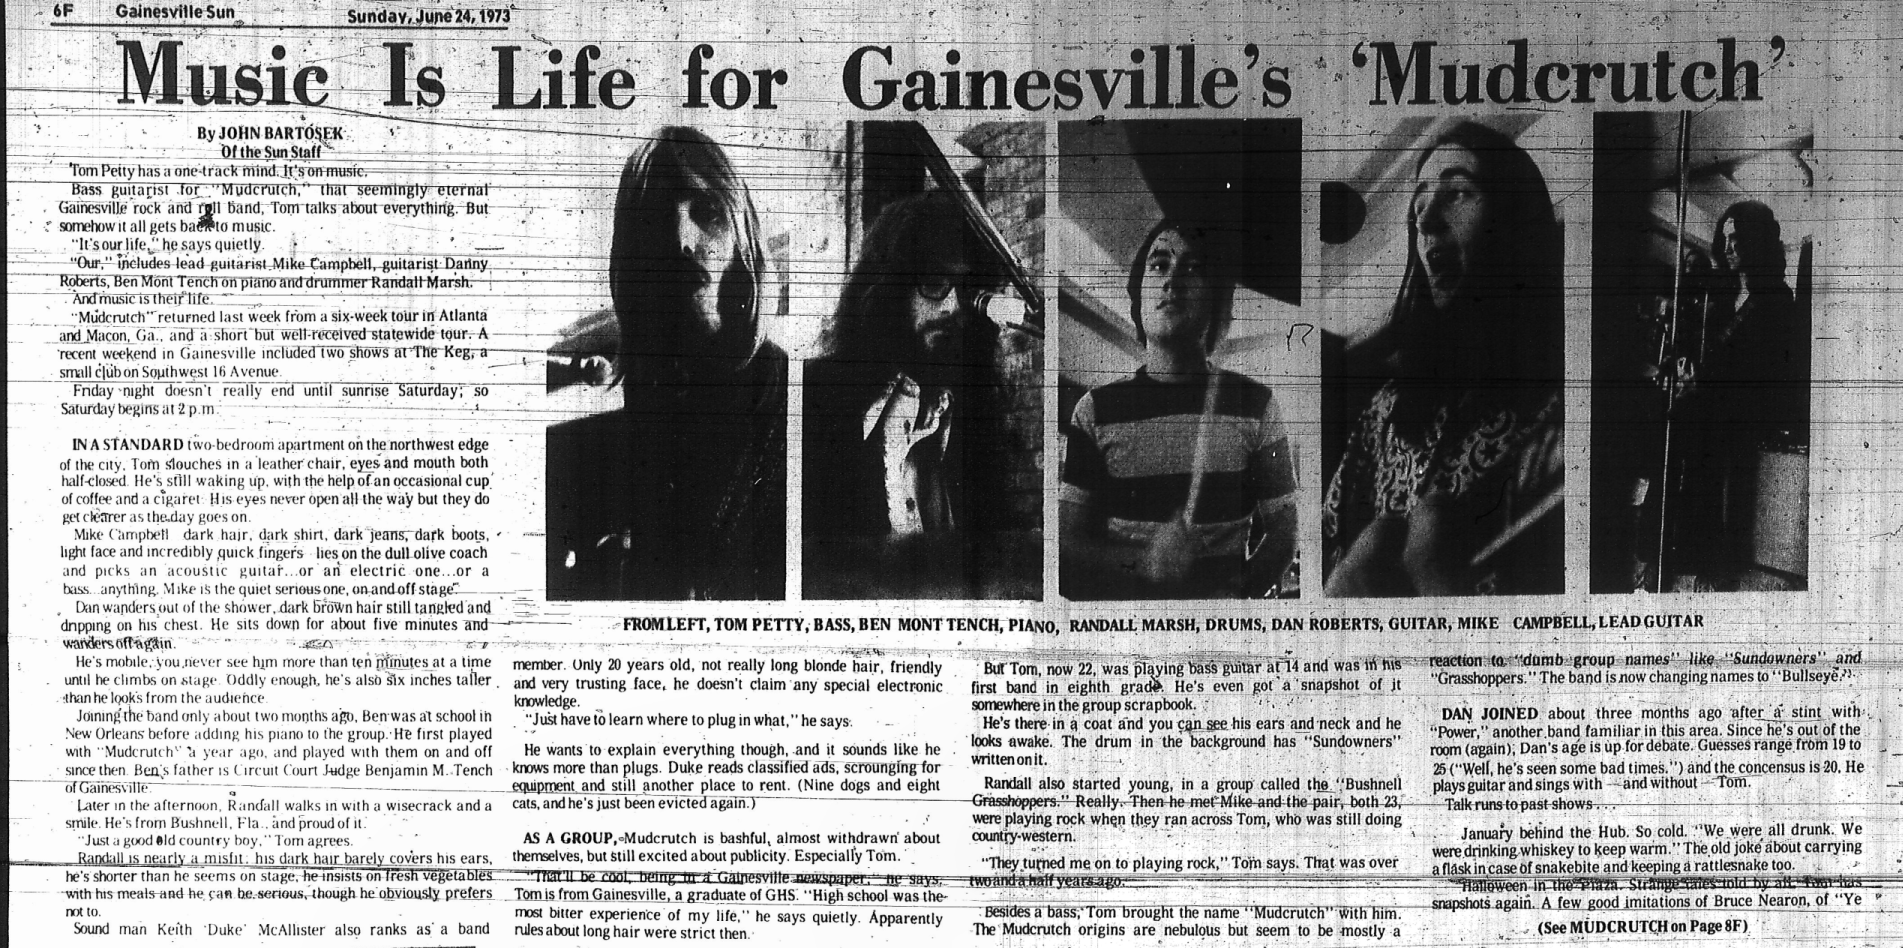 Gainesville Sun - June 24, 1973 - The Petty Archives